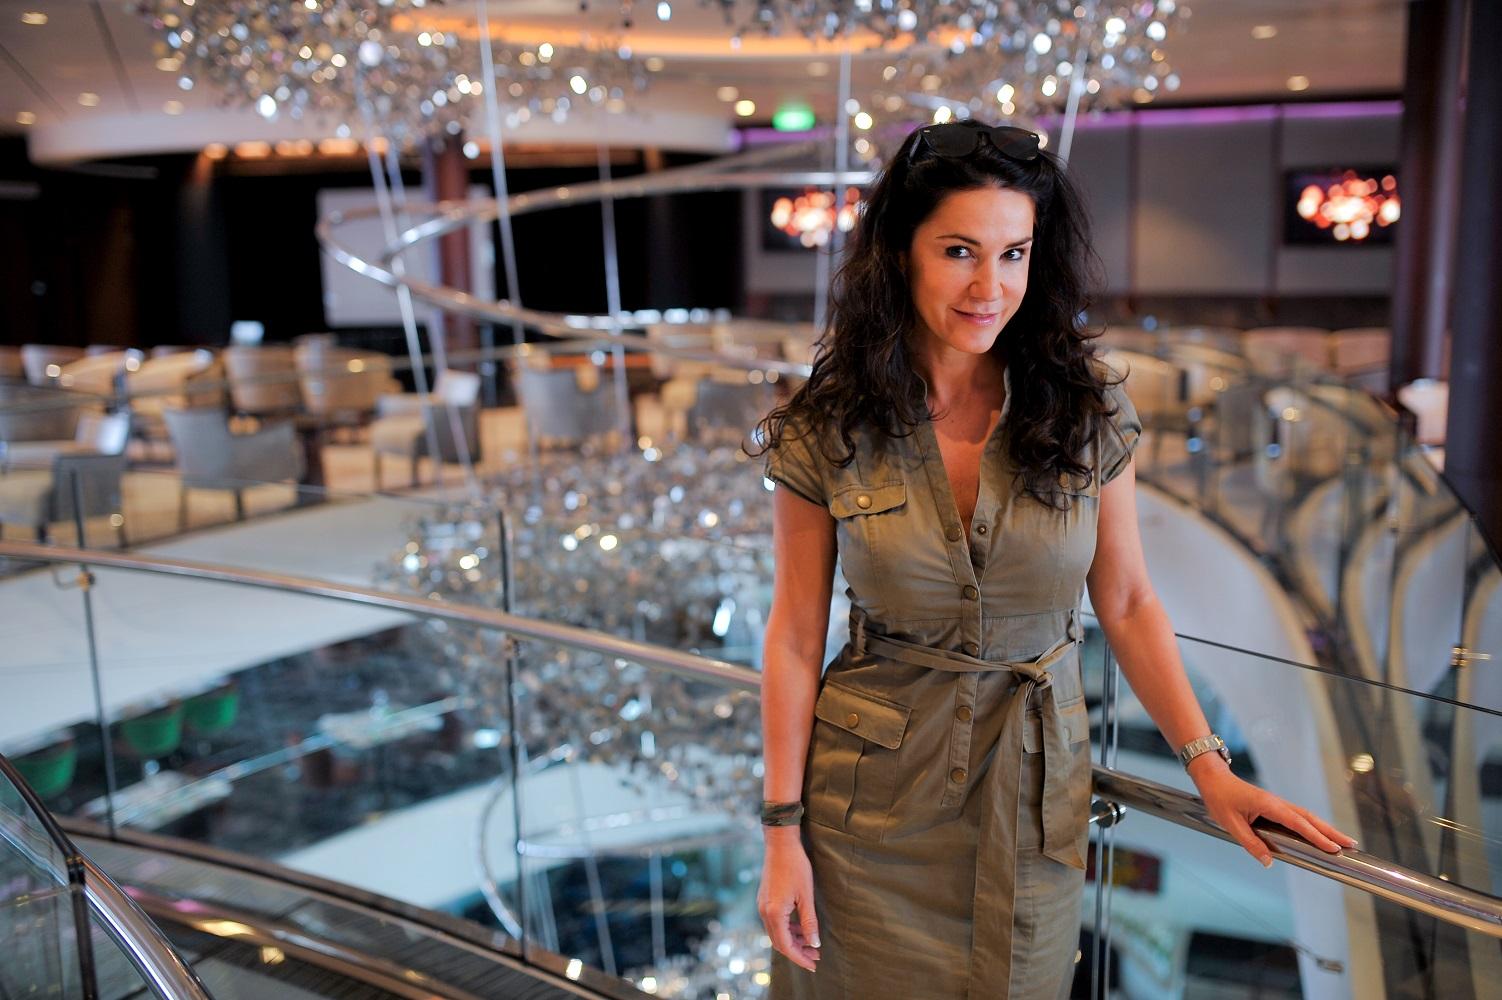 Mein Schiff Fan Mariella Ahrens im Restaurant Atlantik